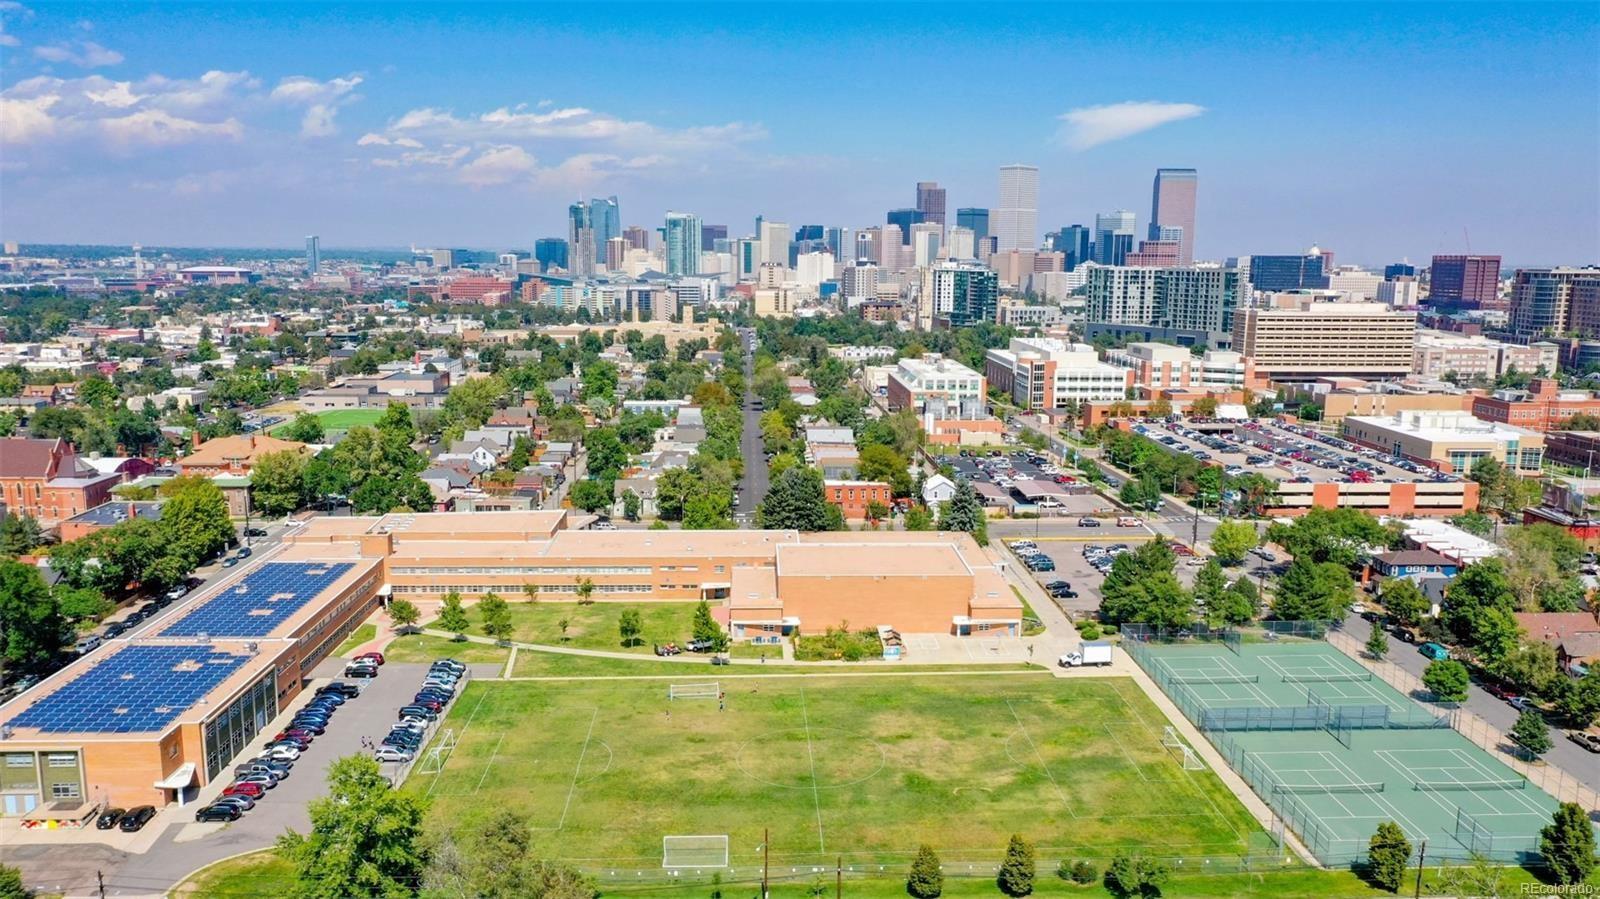 MLS# 9192869 - 1 - 433  Fox Street, Denver, CO 80204